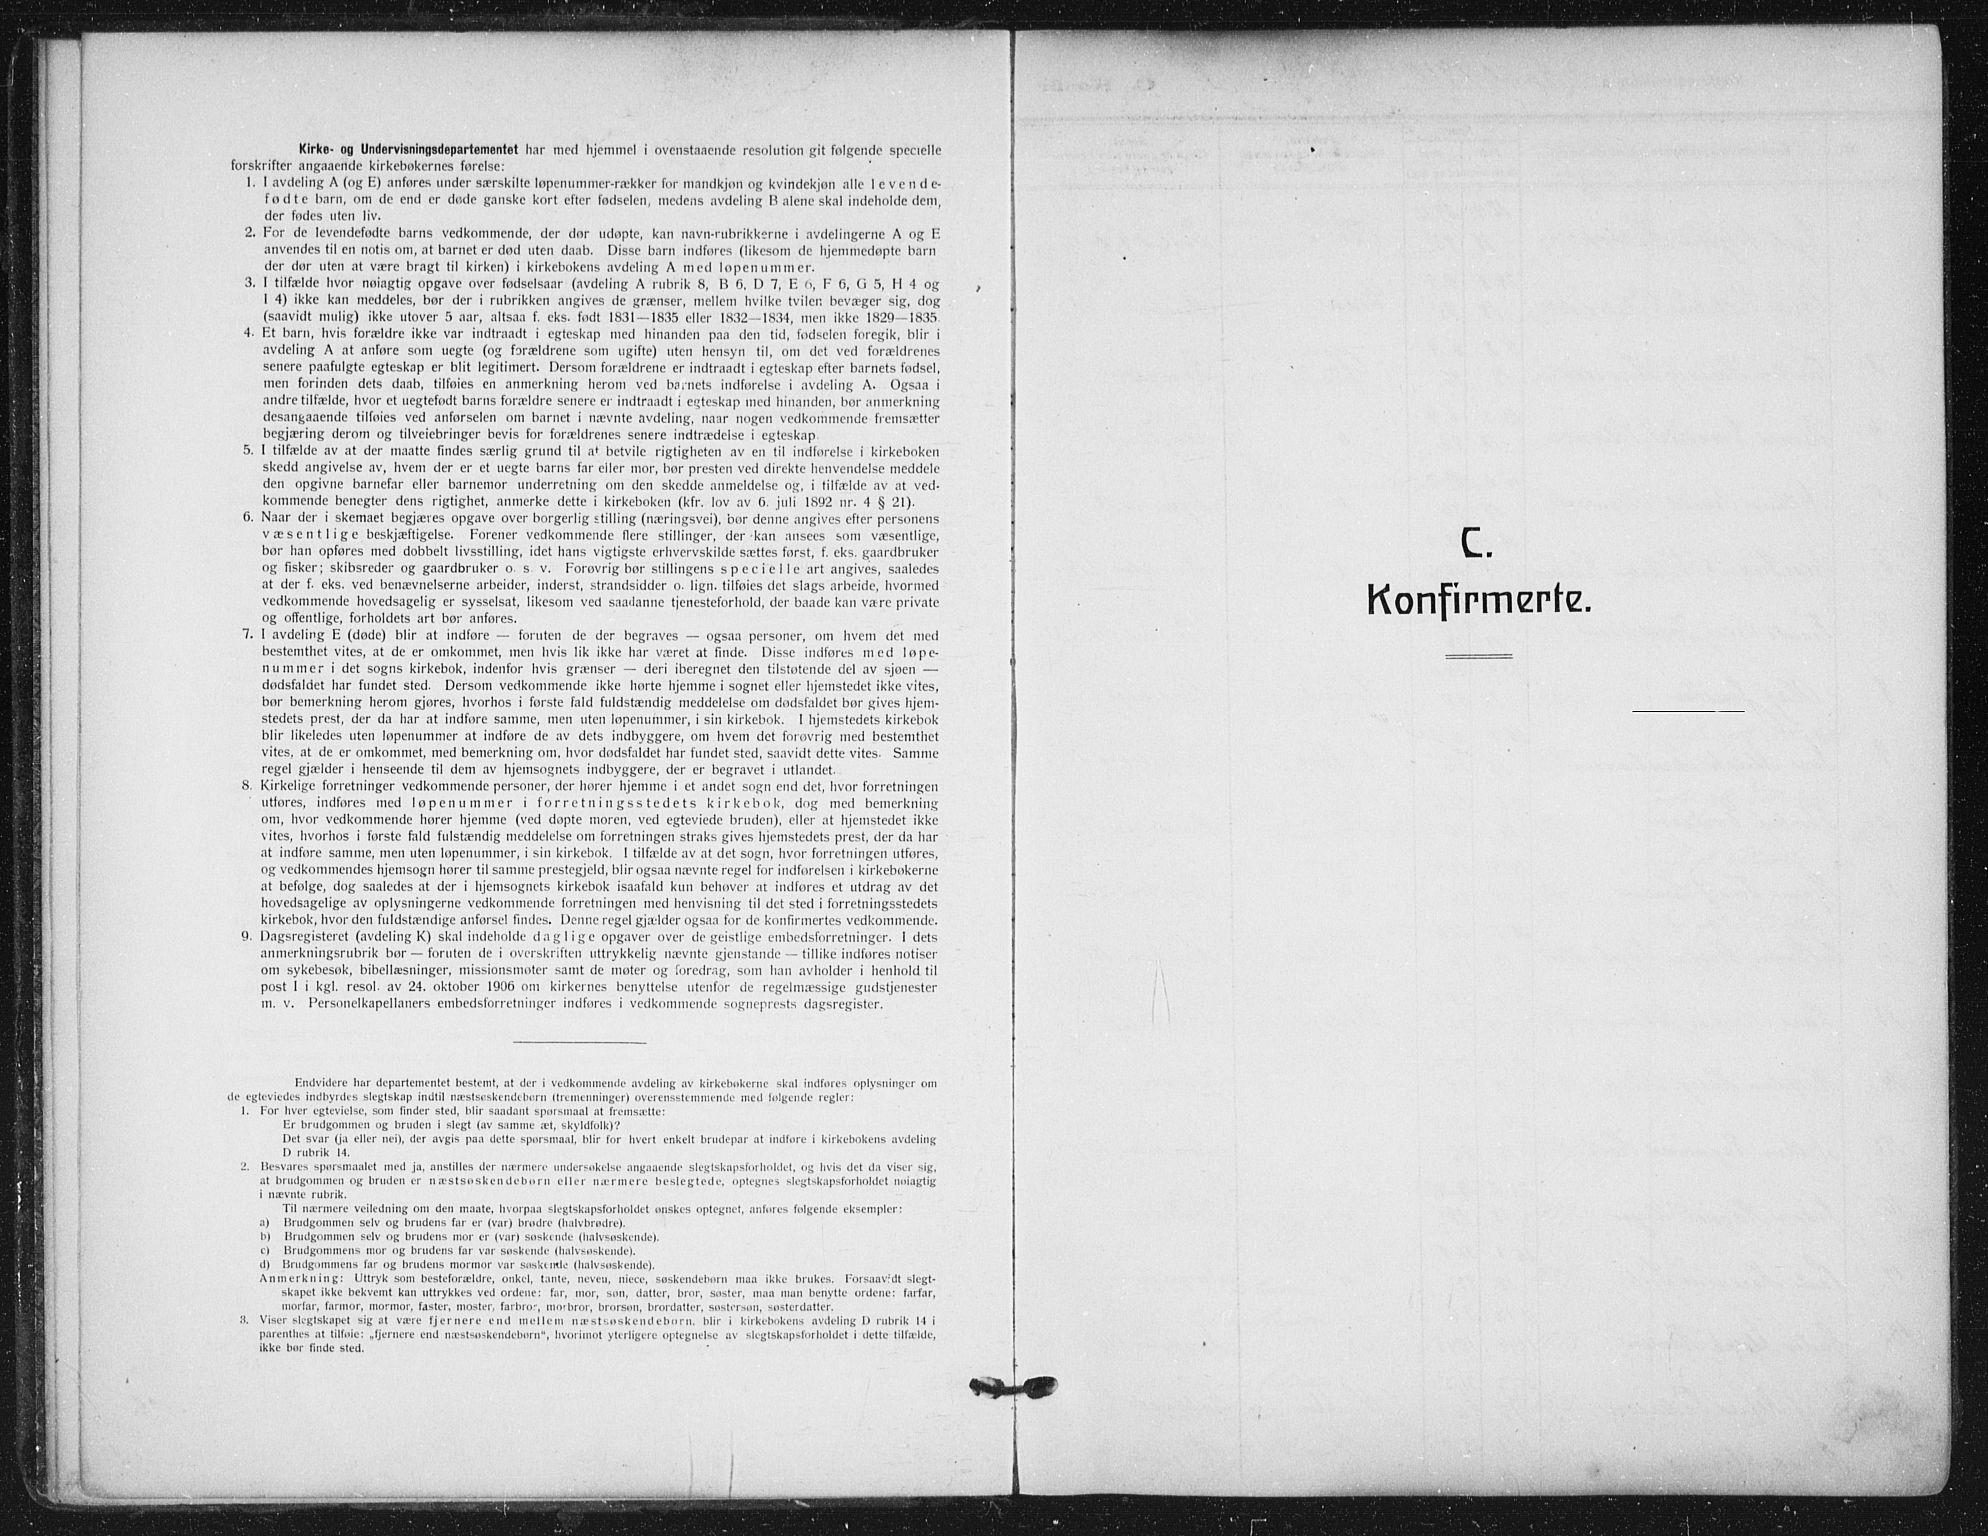 SAO, Sagene prestekontor Kirkebøker, F/L0008: Ministerialbok nr. 8, 1910-1919